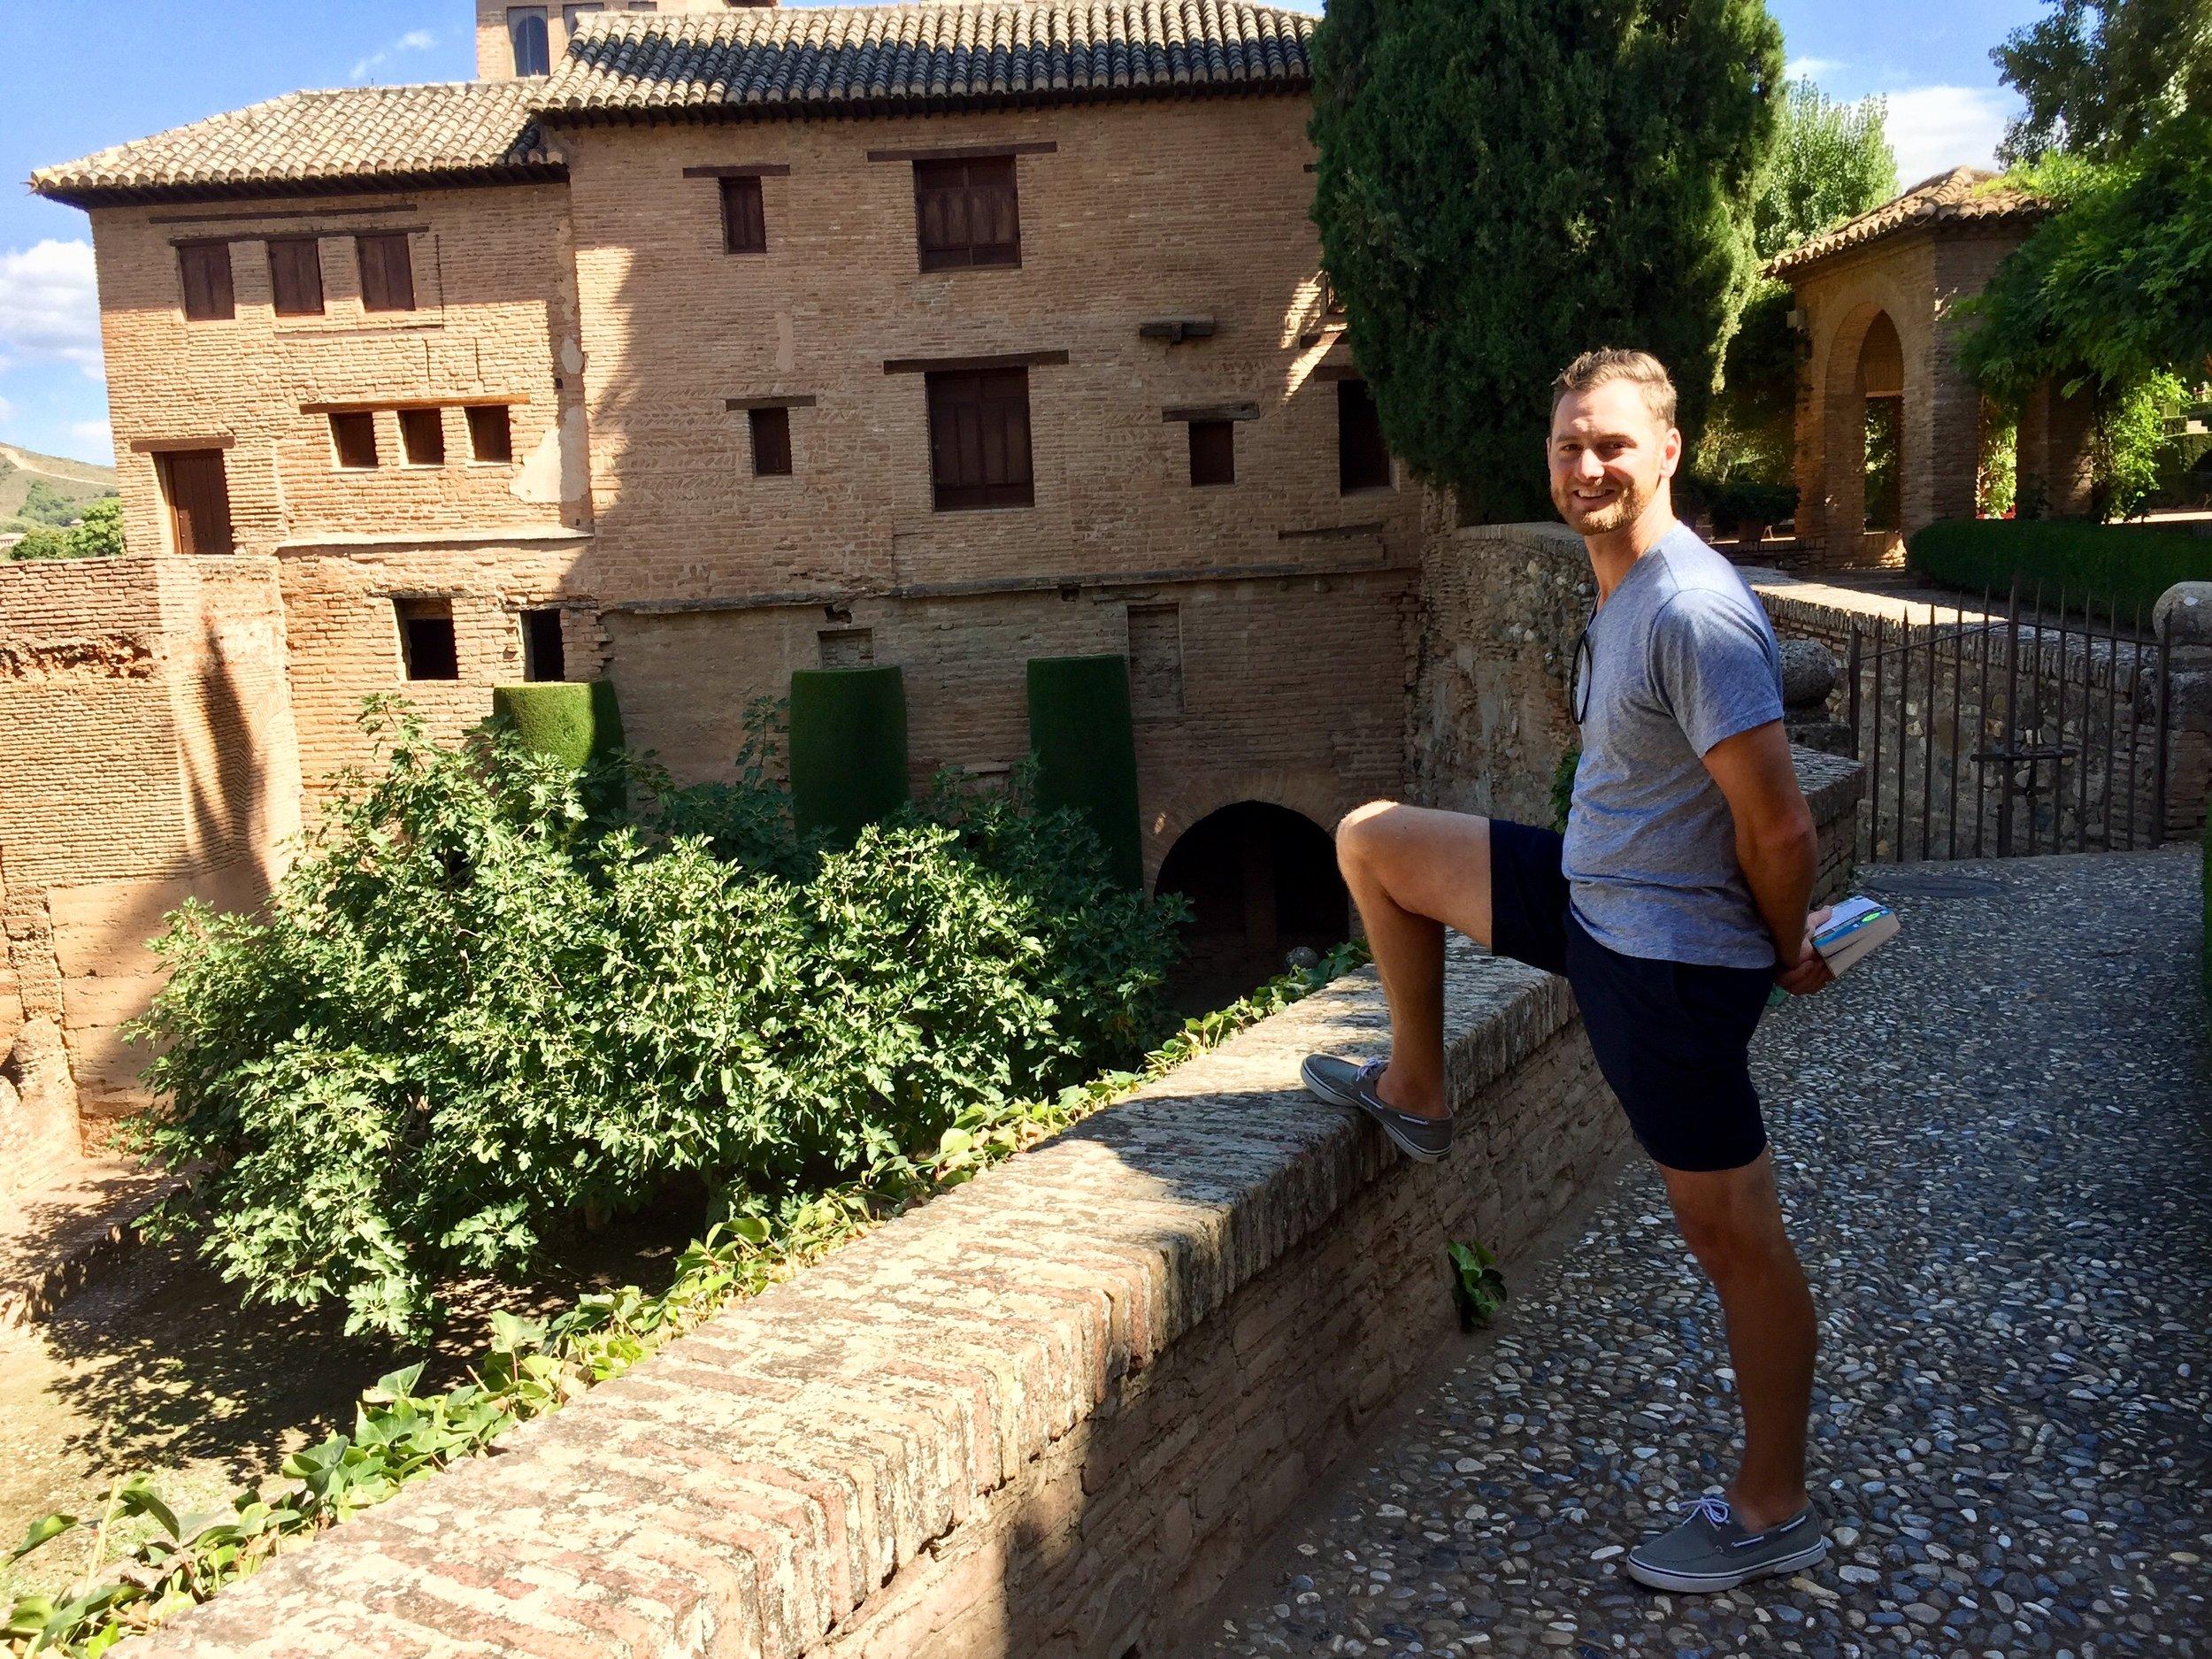 Granada Spain Alhambra Rick Steves.jpg